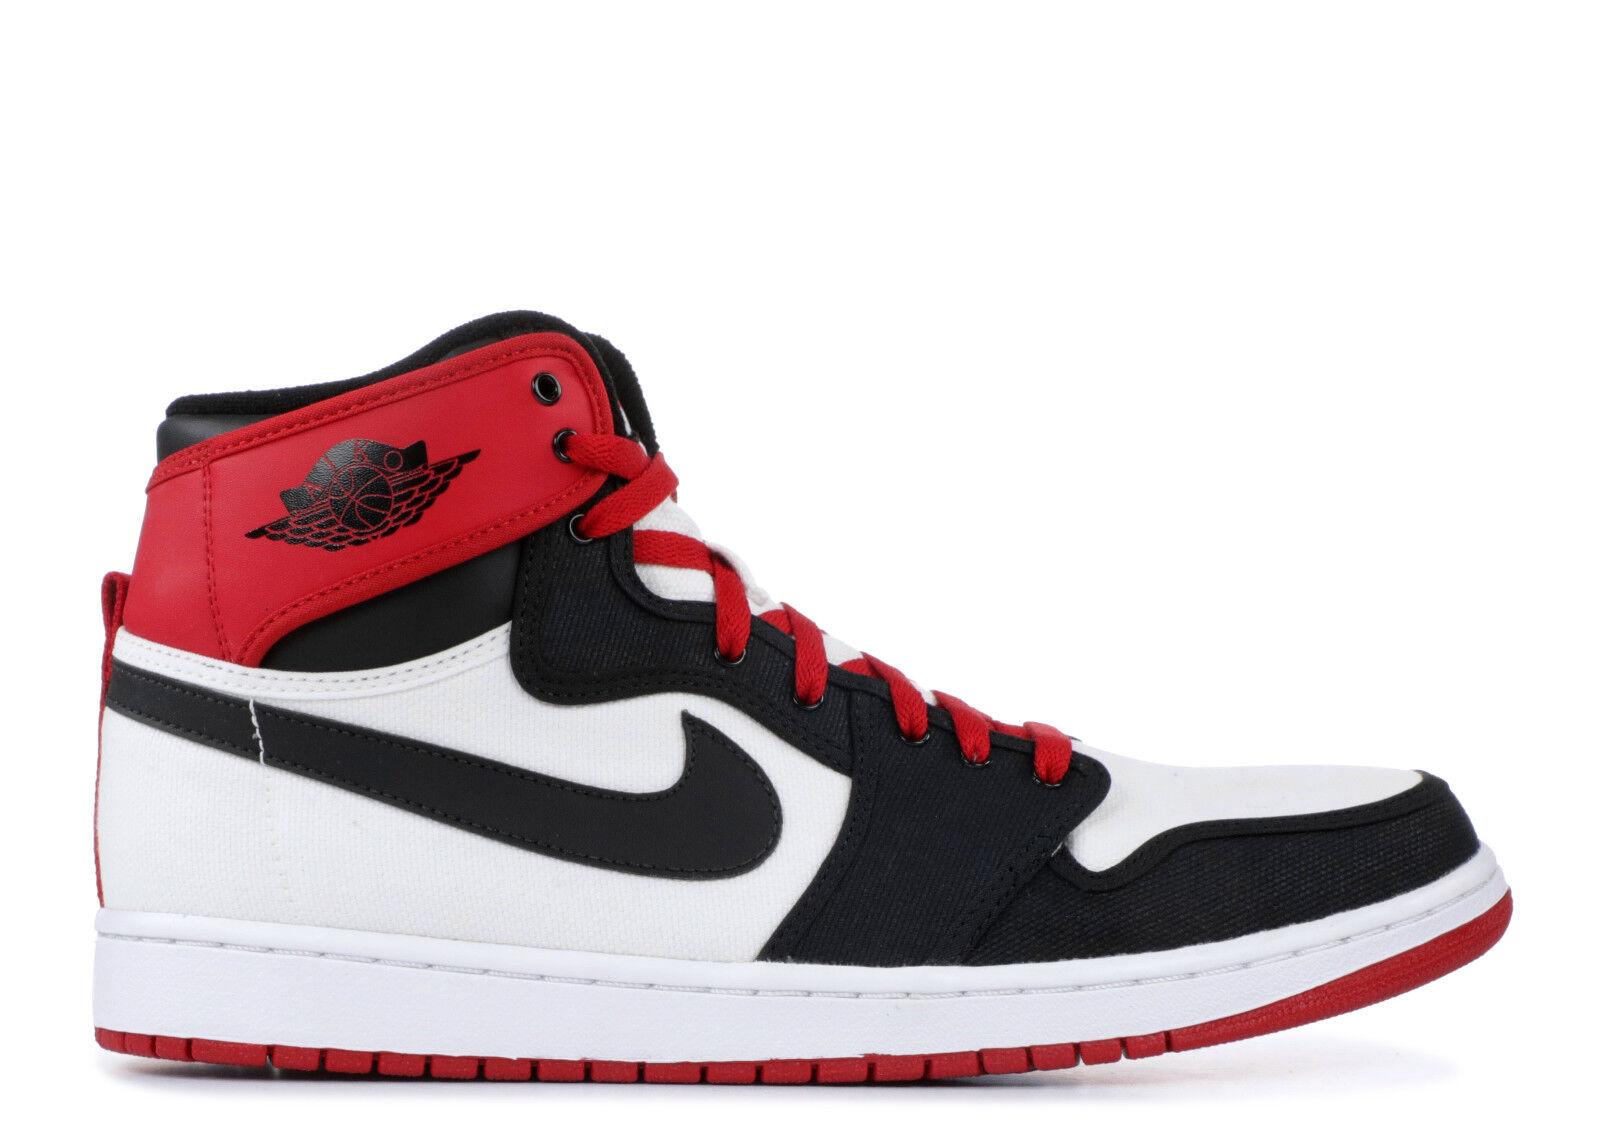 Nike Nike Nike air jordan 1 retro - hohe schwarze der größe 10.402297-110 gezüchtet, og royal 93eebd